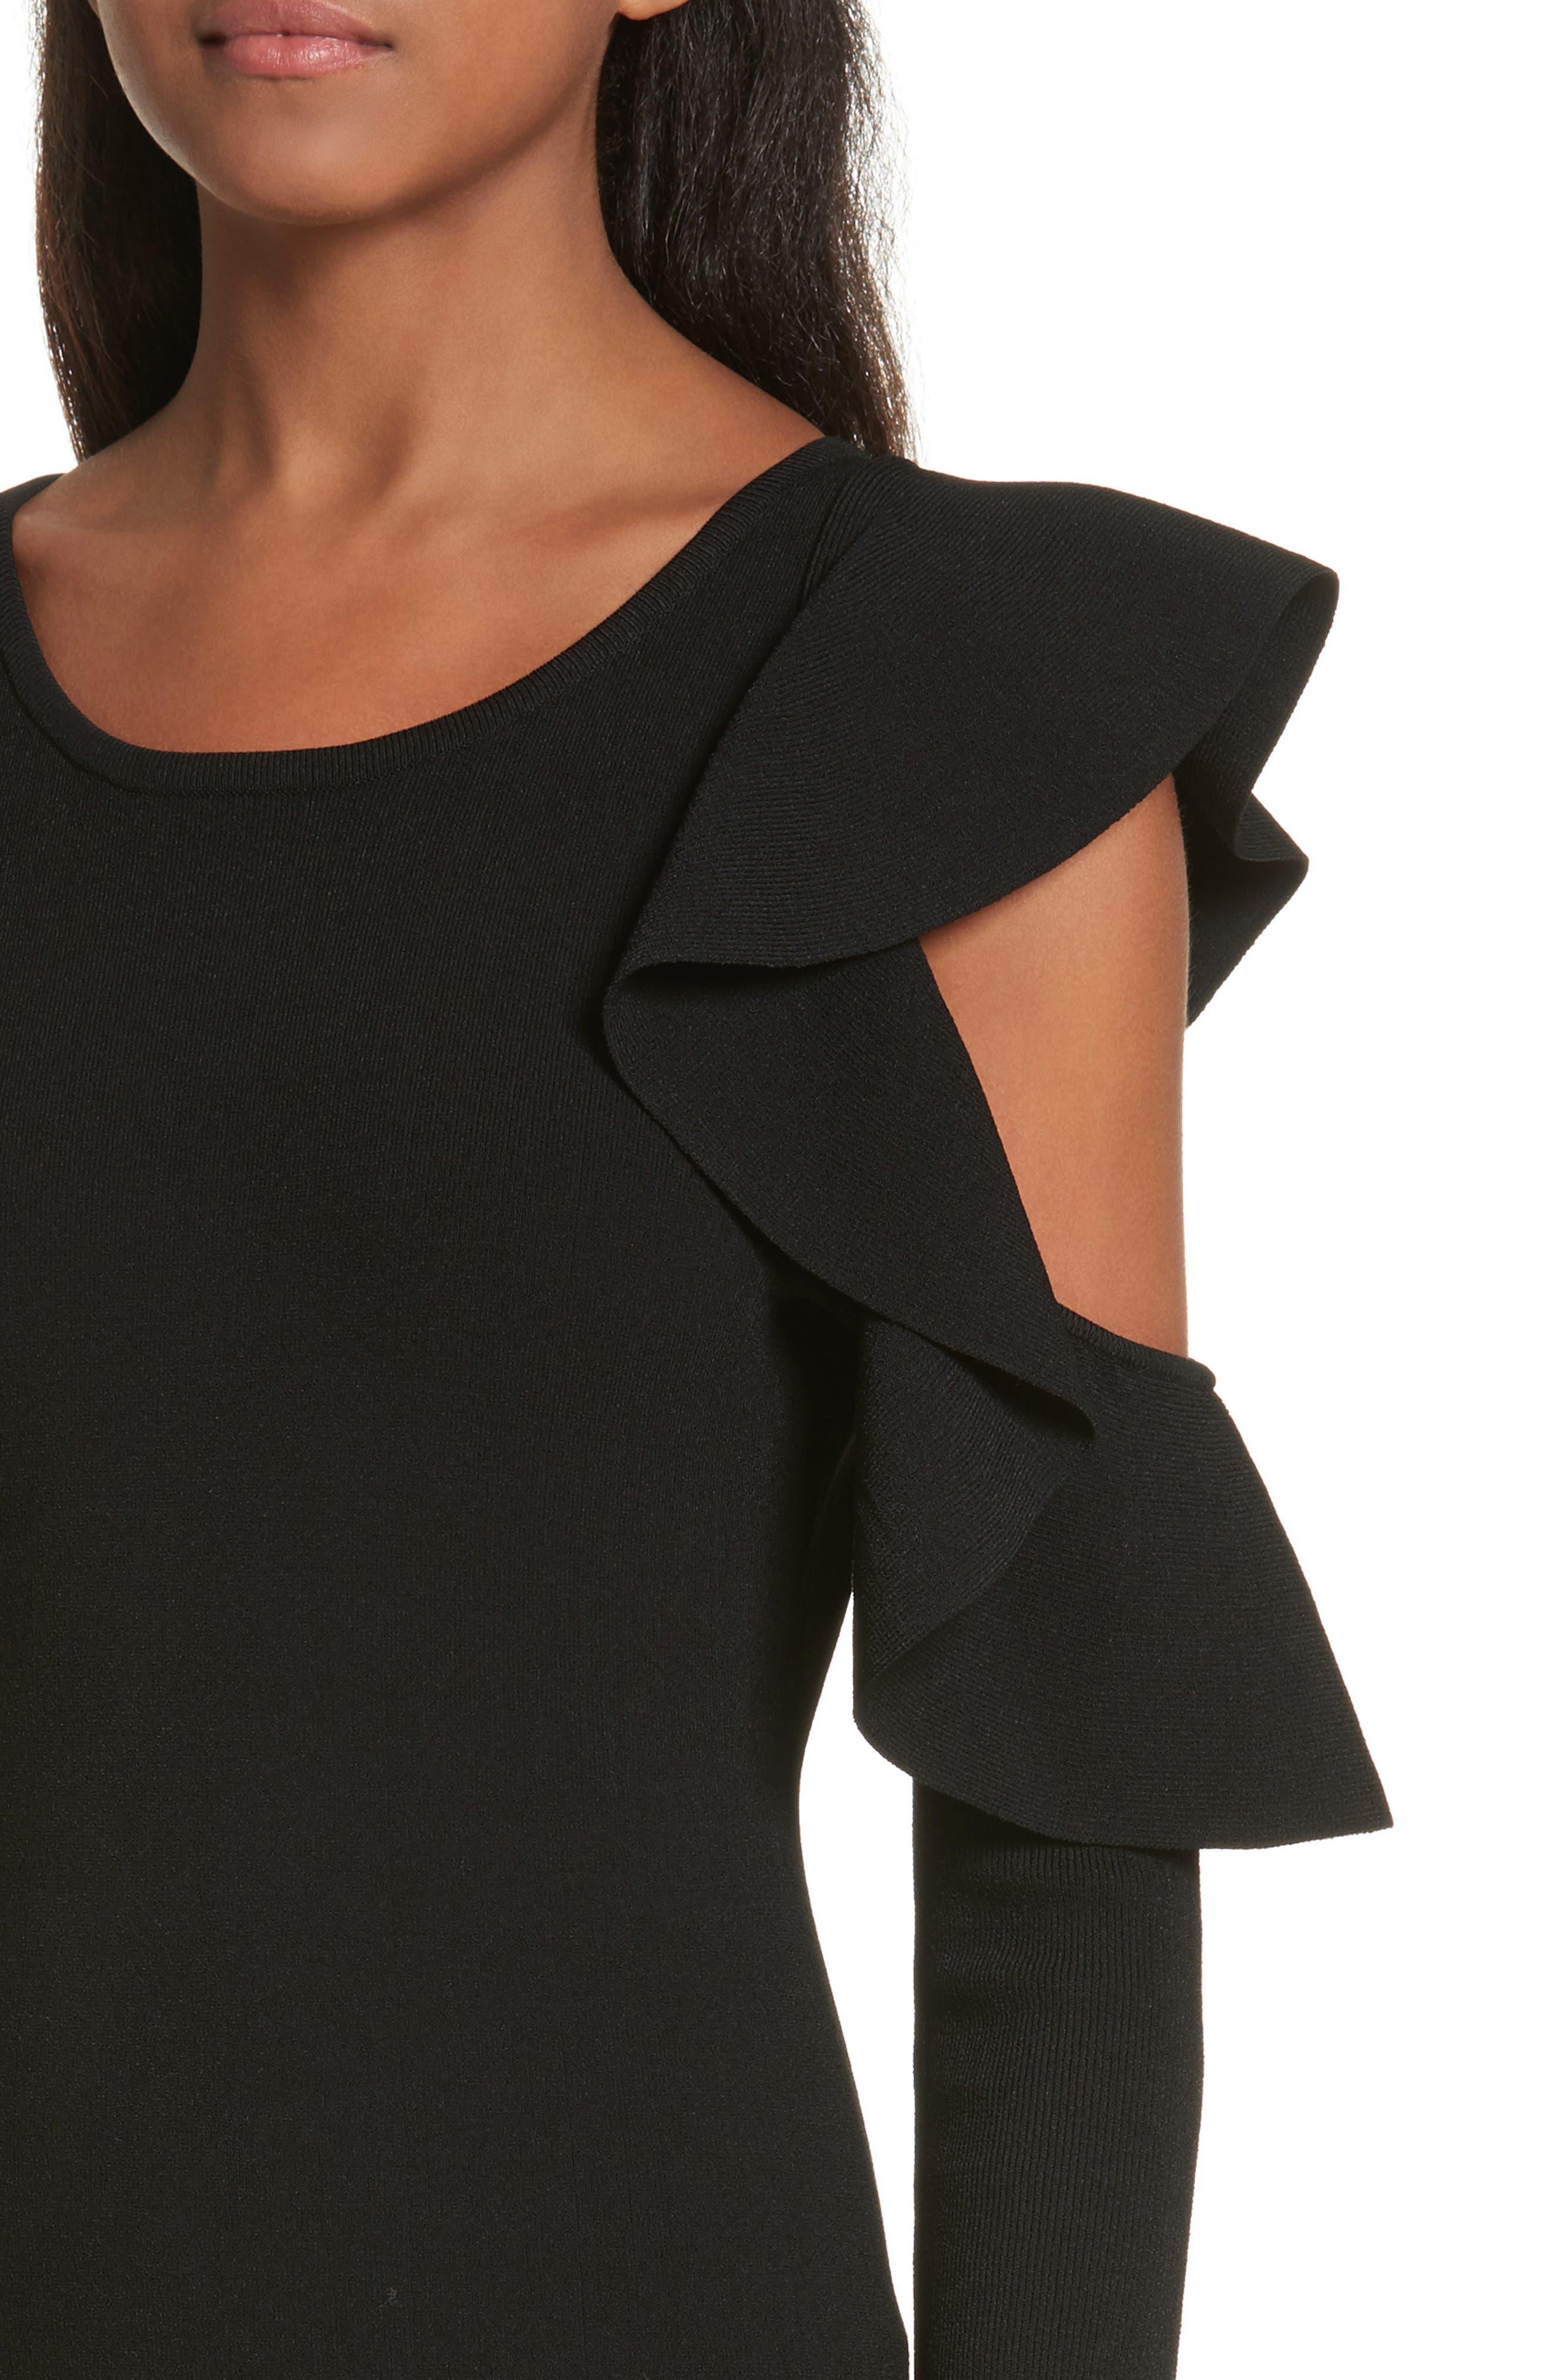 Cold Shoulder Flounce Sheath Dress,                             Alternate thumbnail 4, color,                             Black